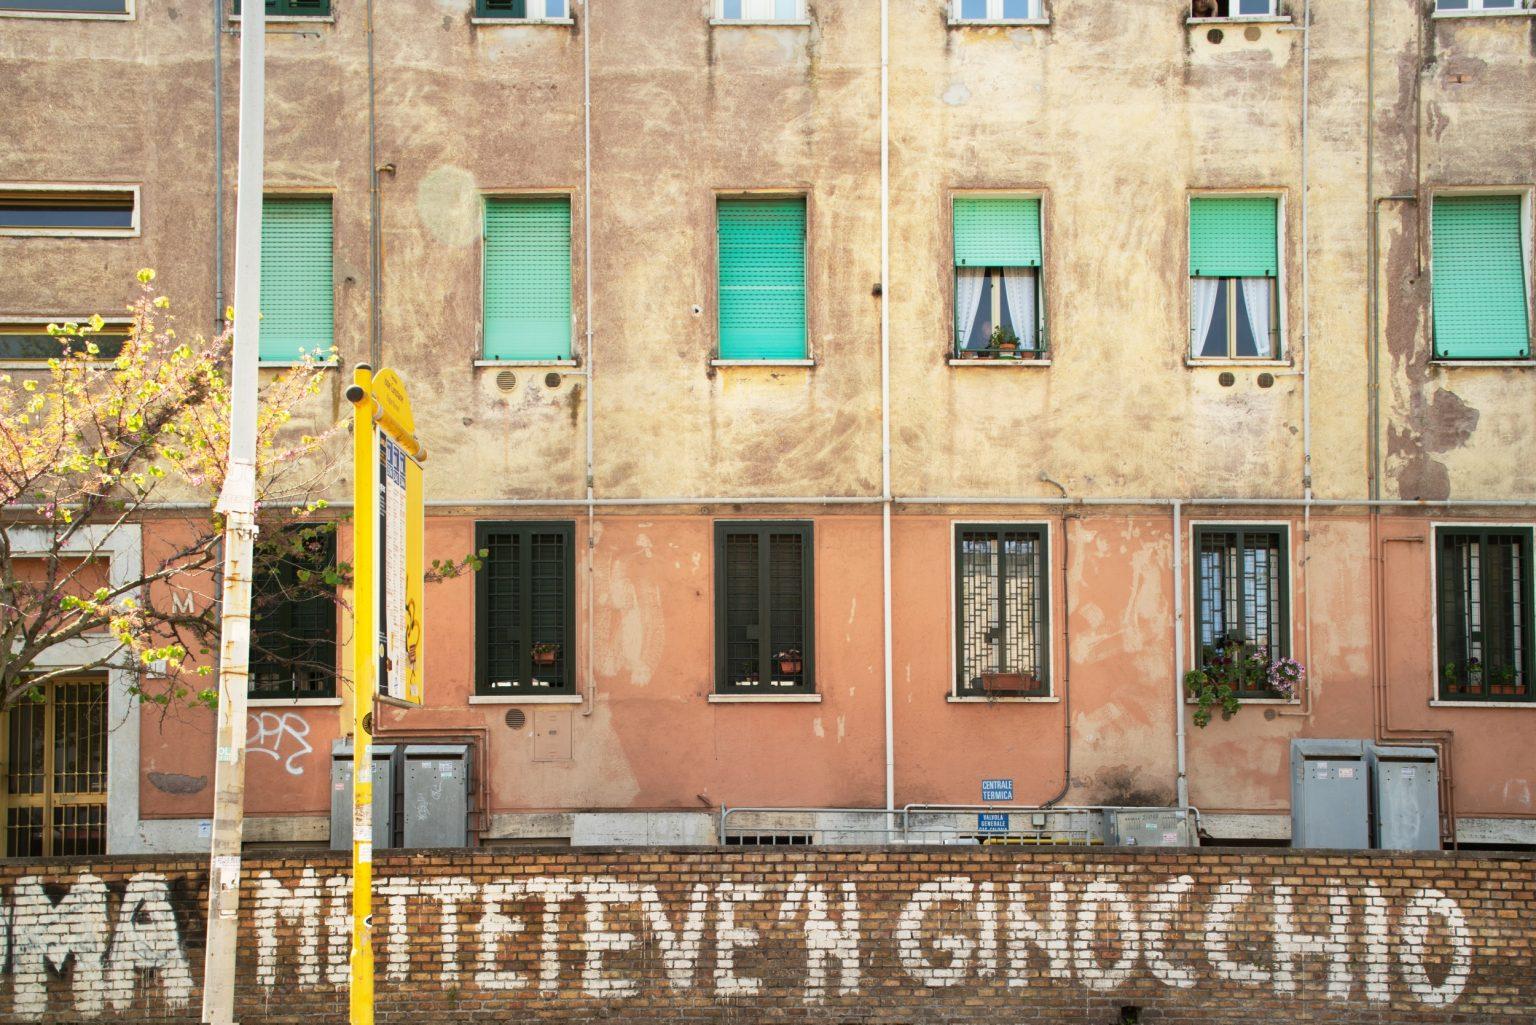 Via delle Vigne Nuove, Tufello neighborhood. Rome, Italy, 2017